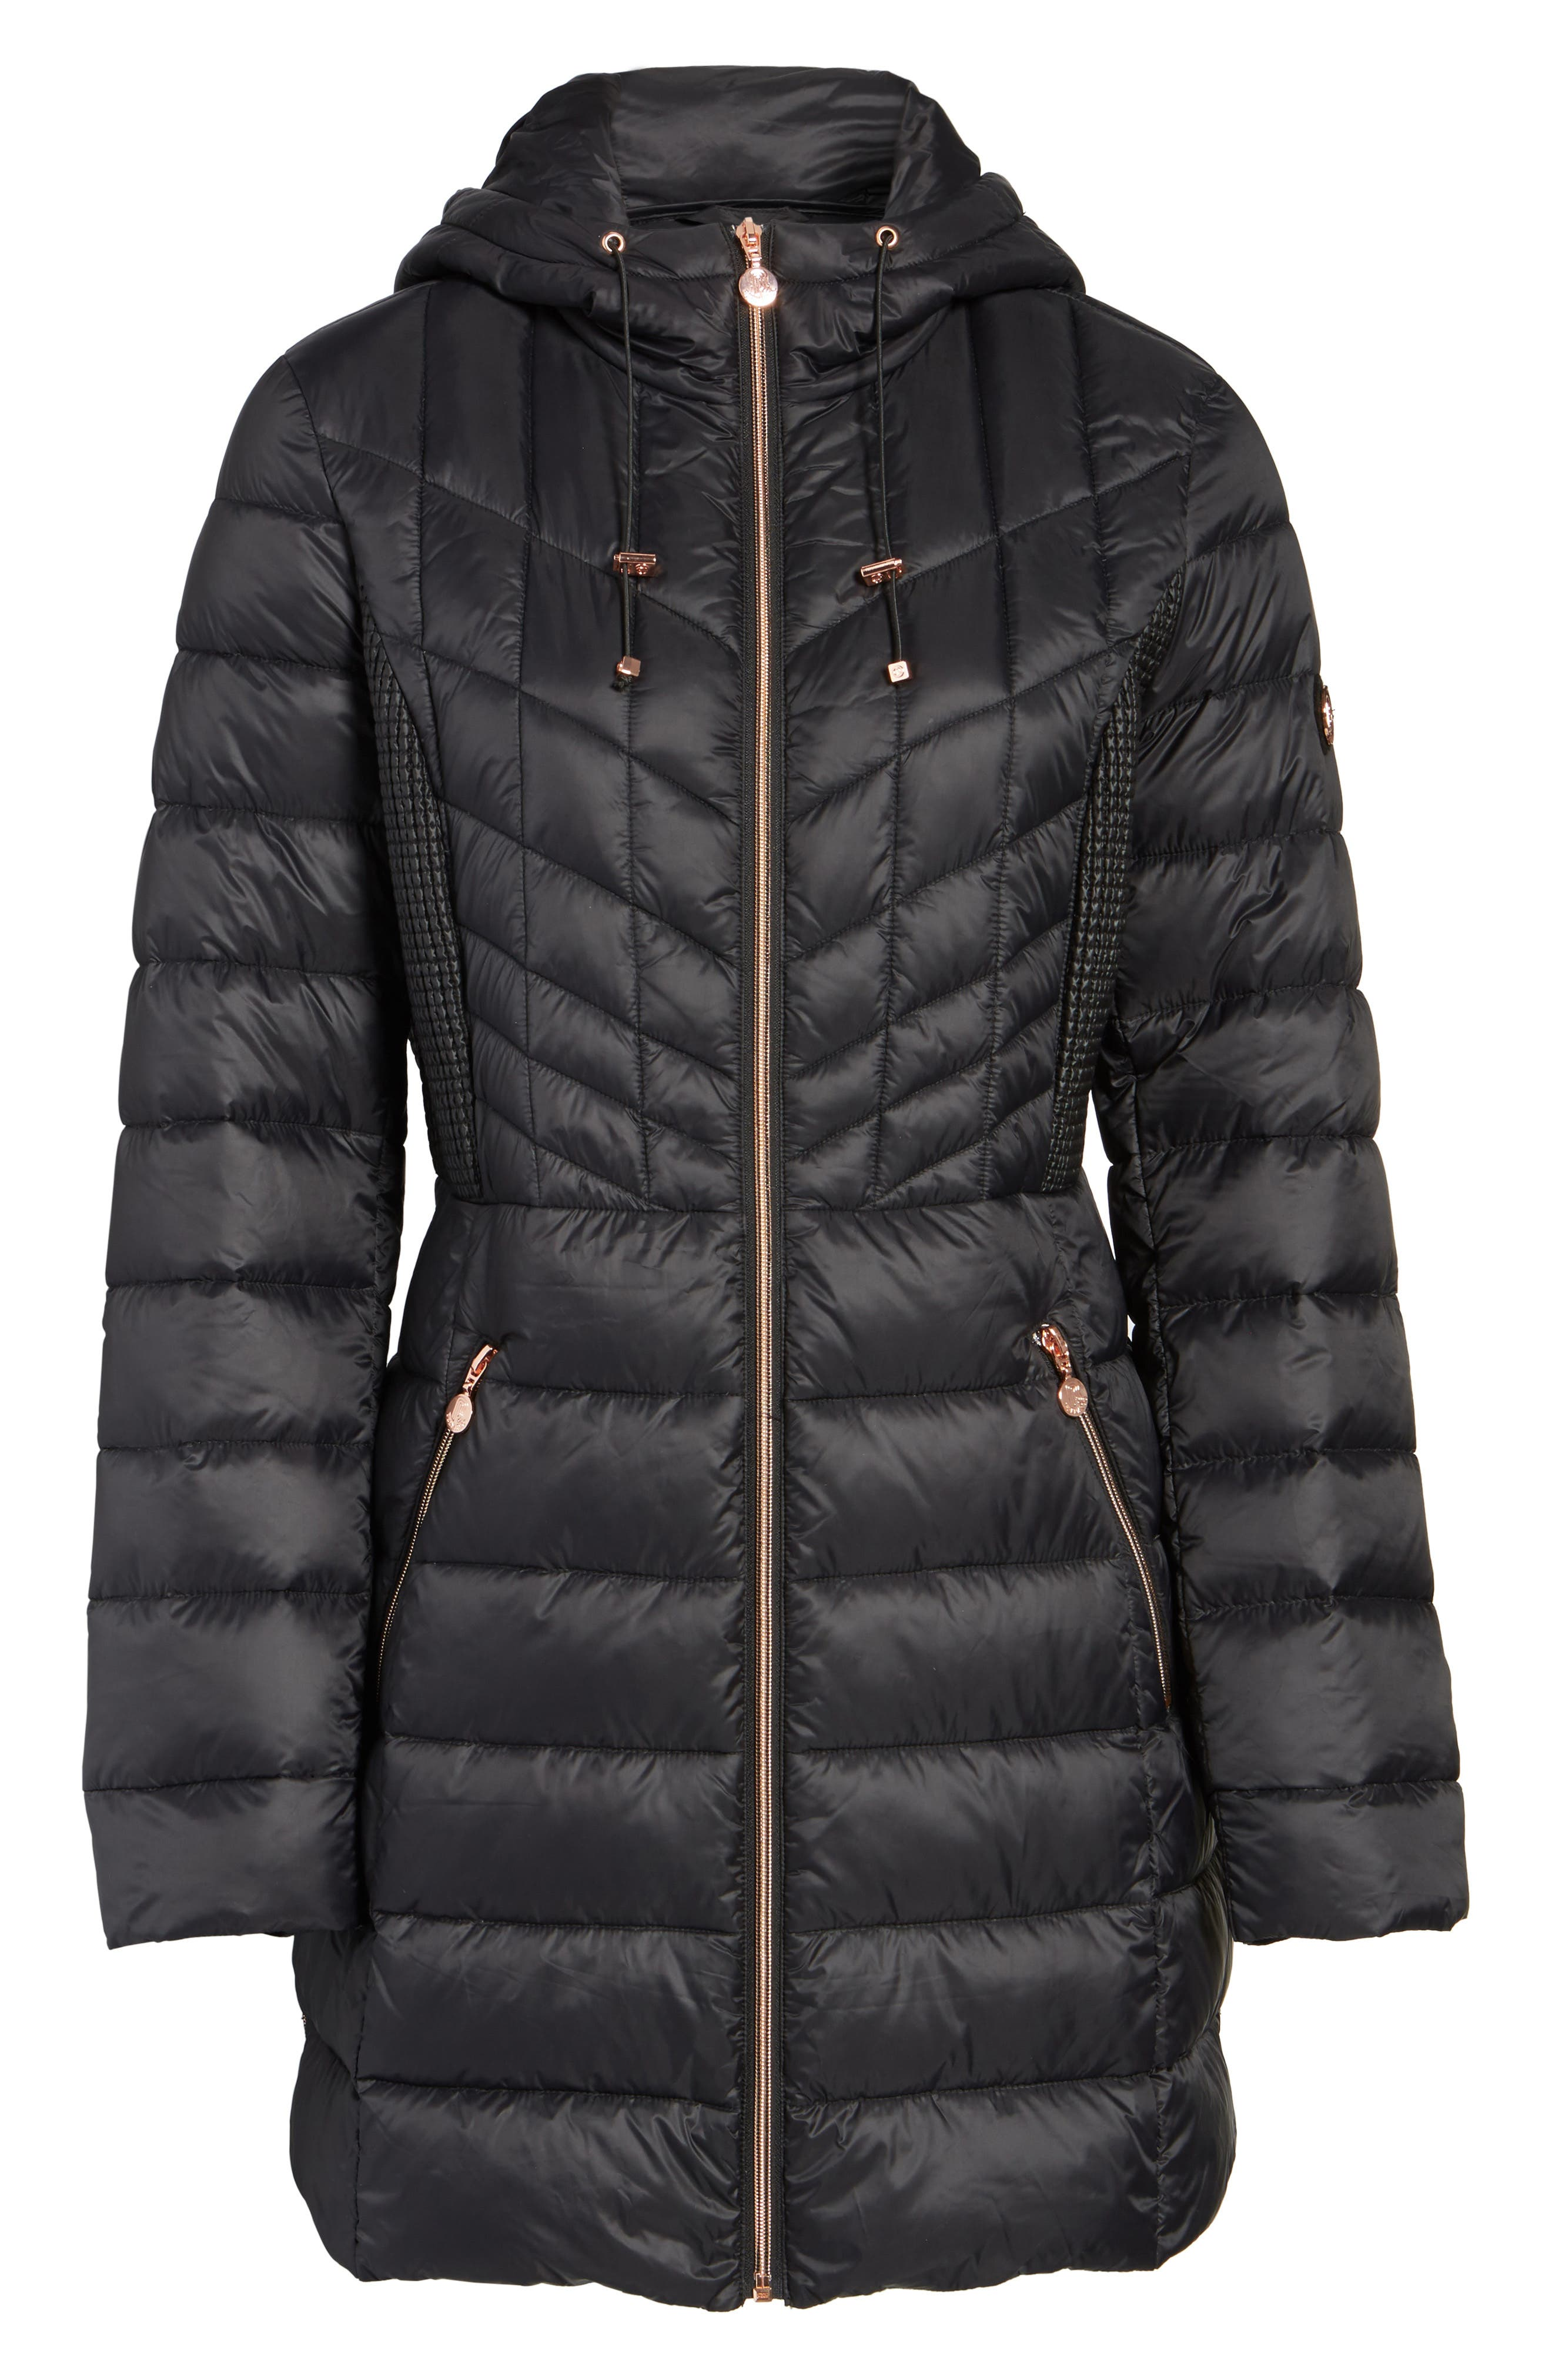 BERNARDO, Hooded Packable Down & PrimaLoft<sup>®</sup> Coat, Alternate thumbnail 6, color, BLACK